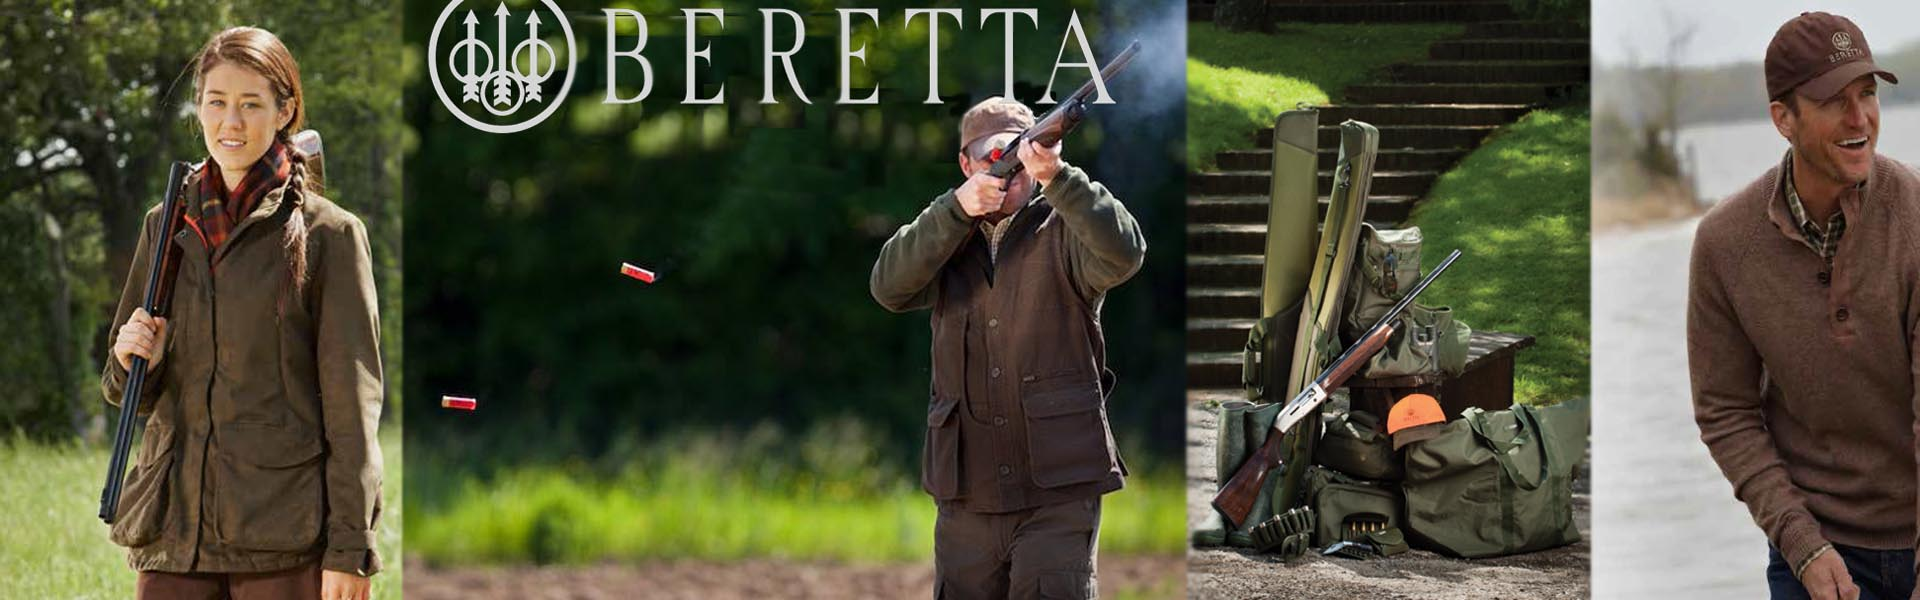 Beretta Products Slide